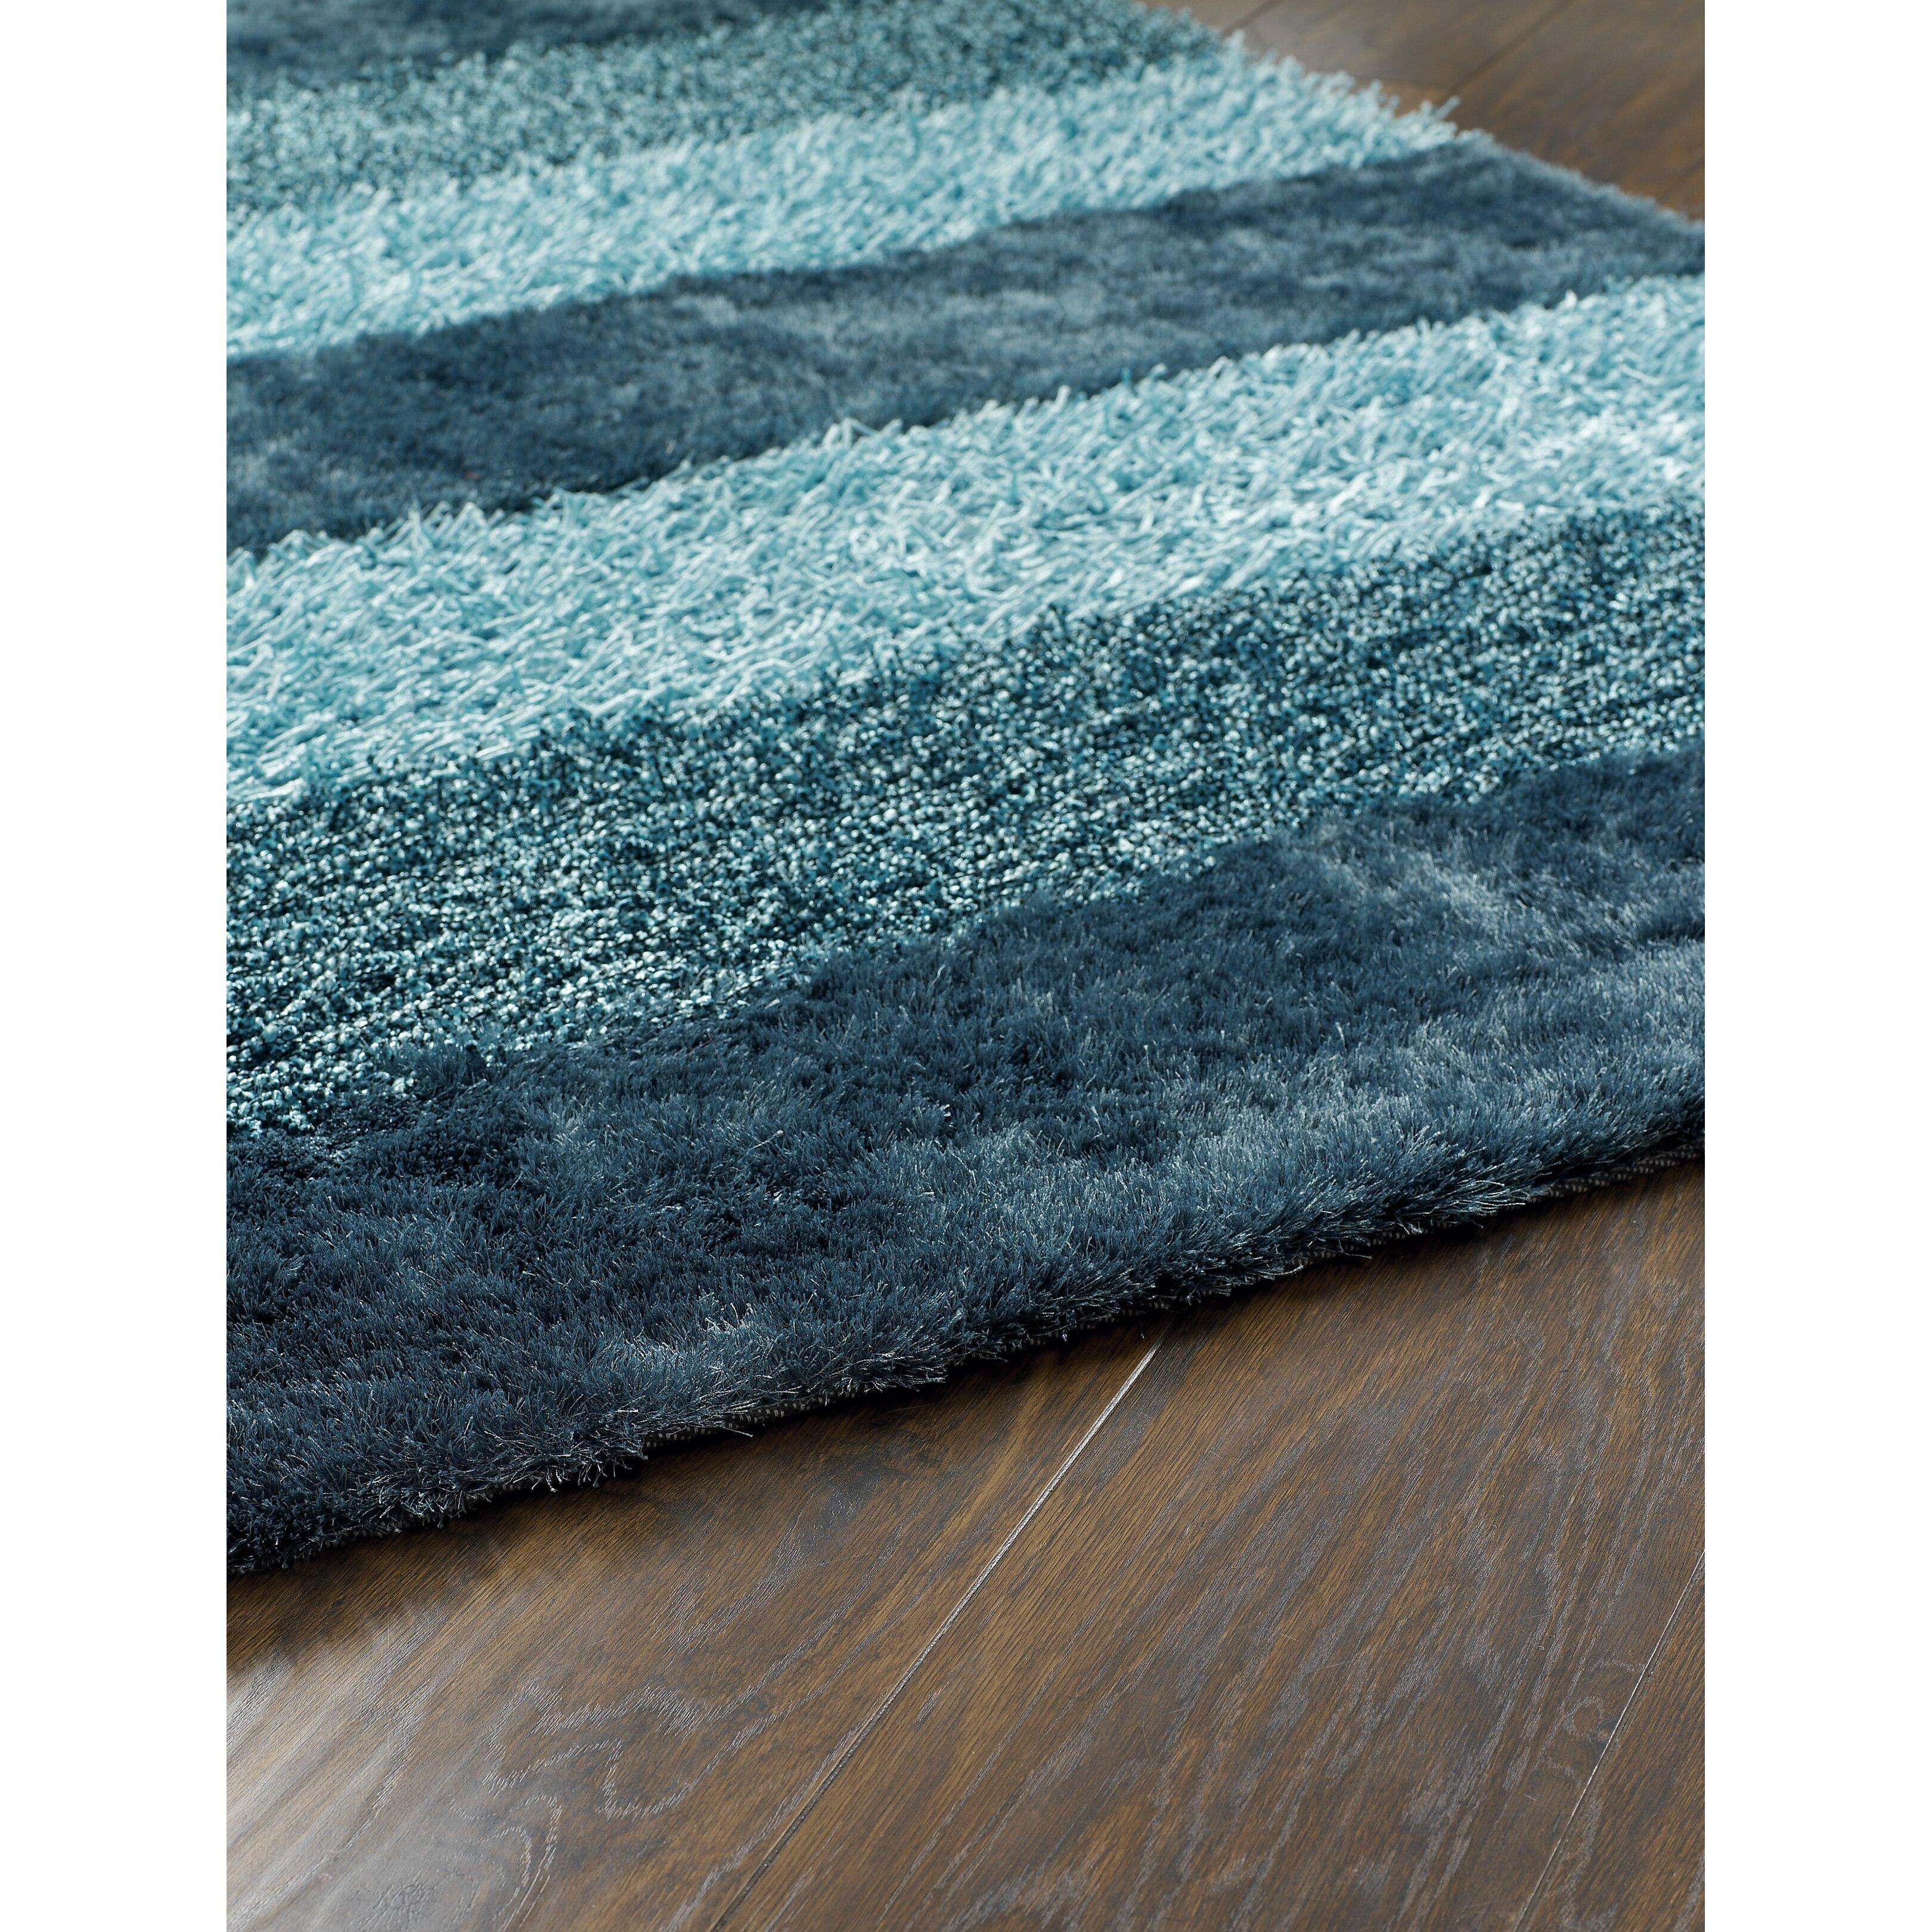 grey and teal area rug tlsplantcom teal living room rug acci